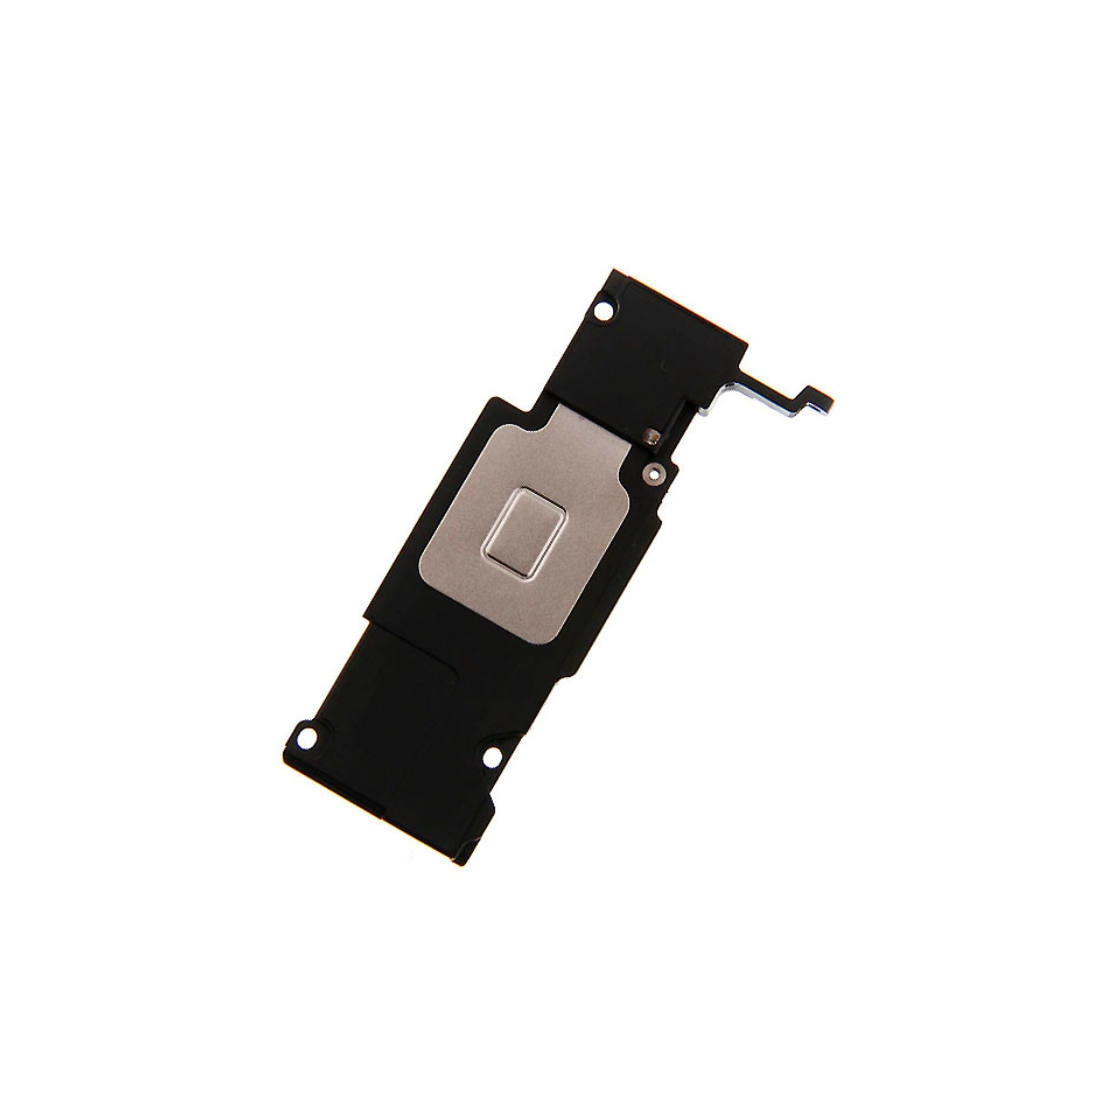 Apple iPhone 6 (4.7), gyári beszéd hangszóró eMAG.hu